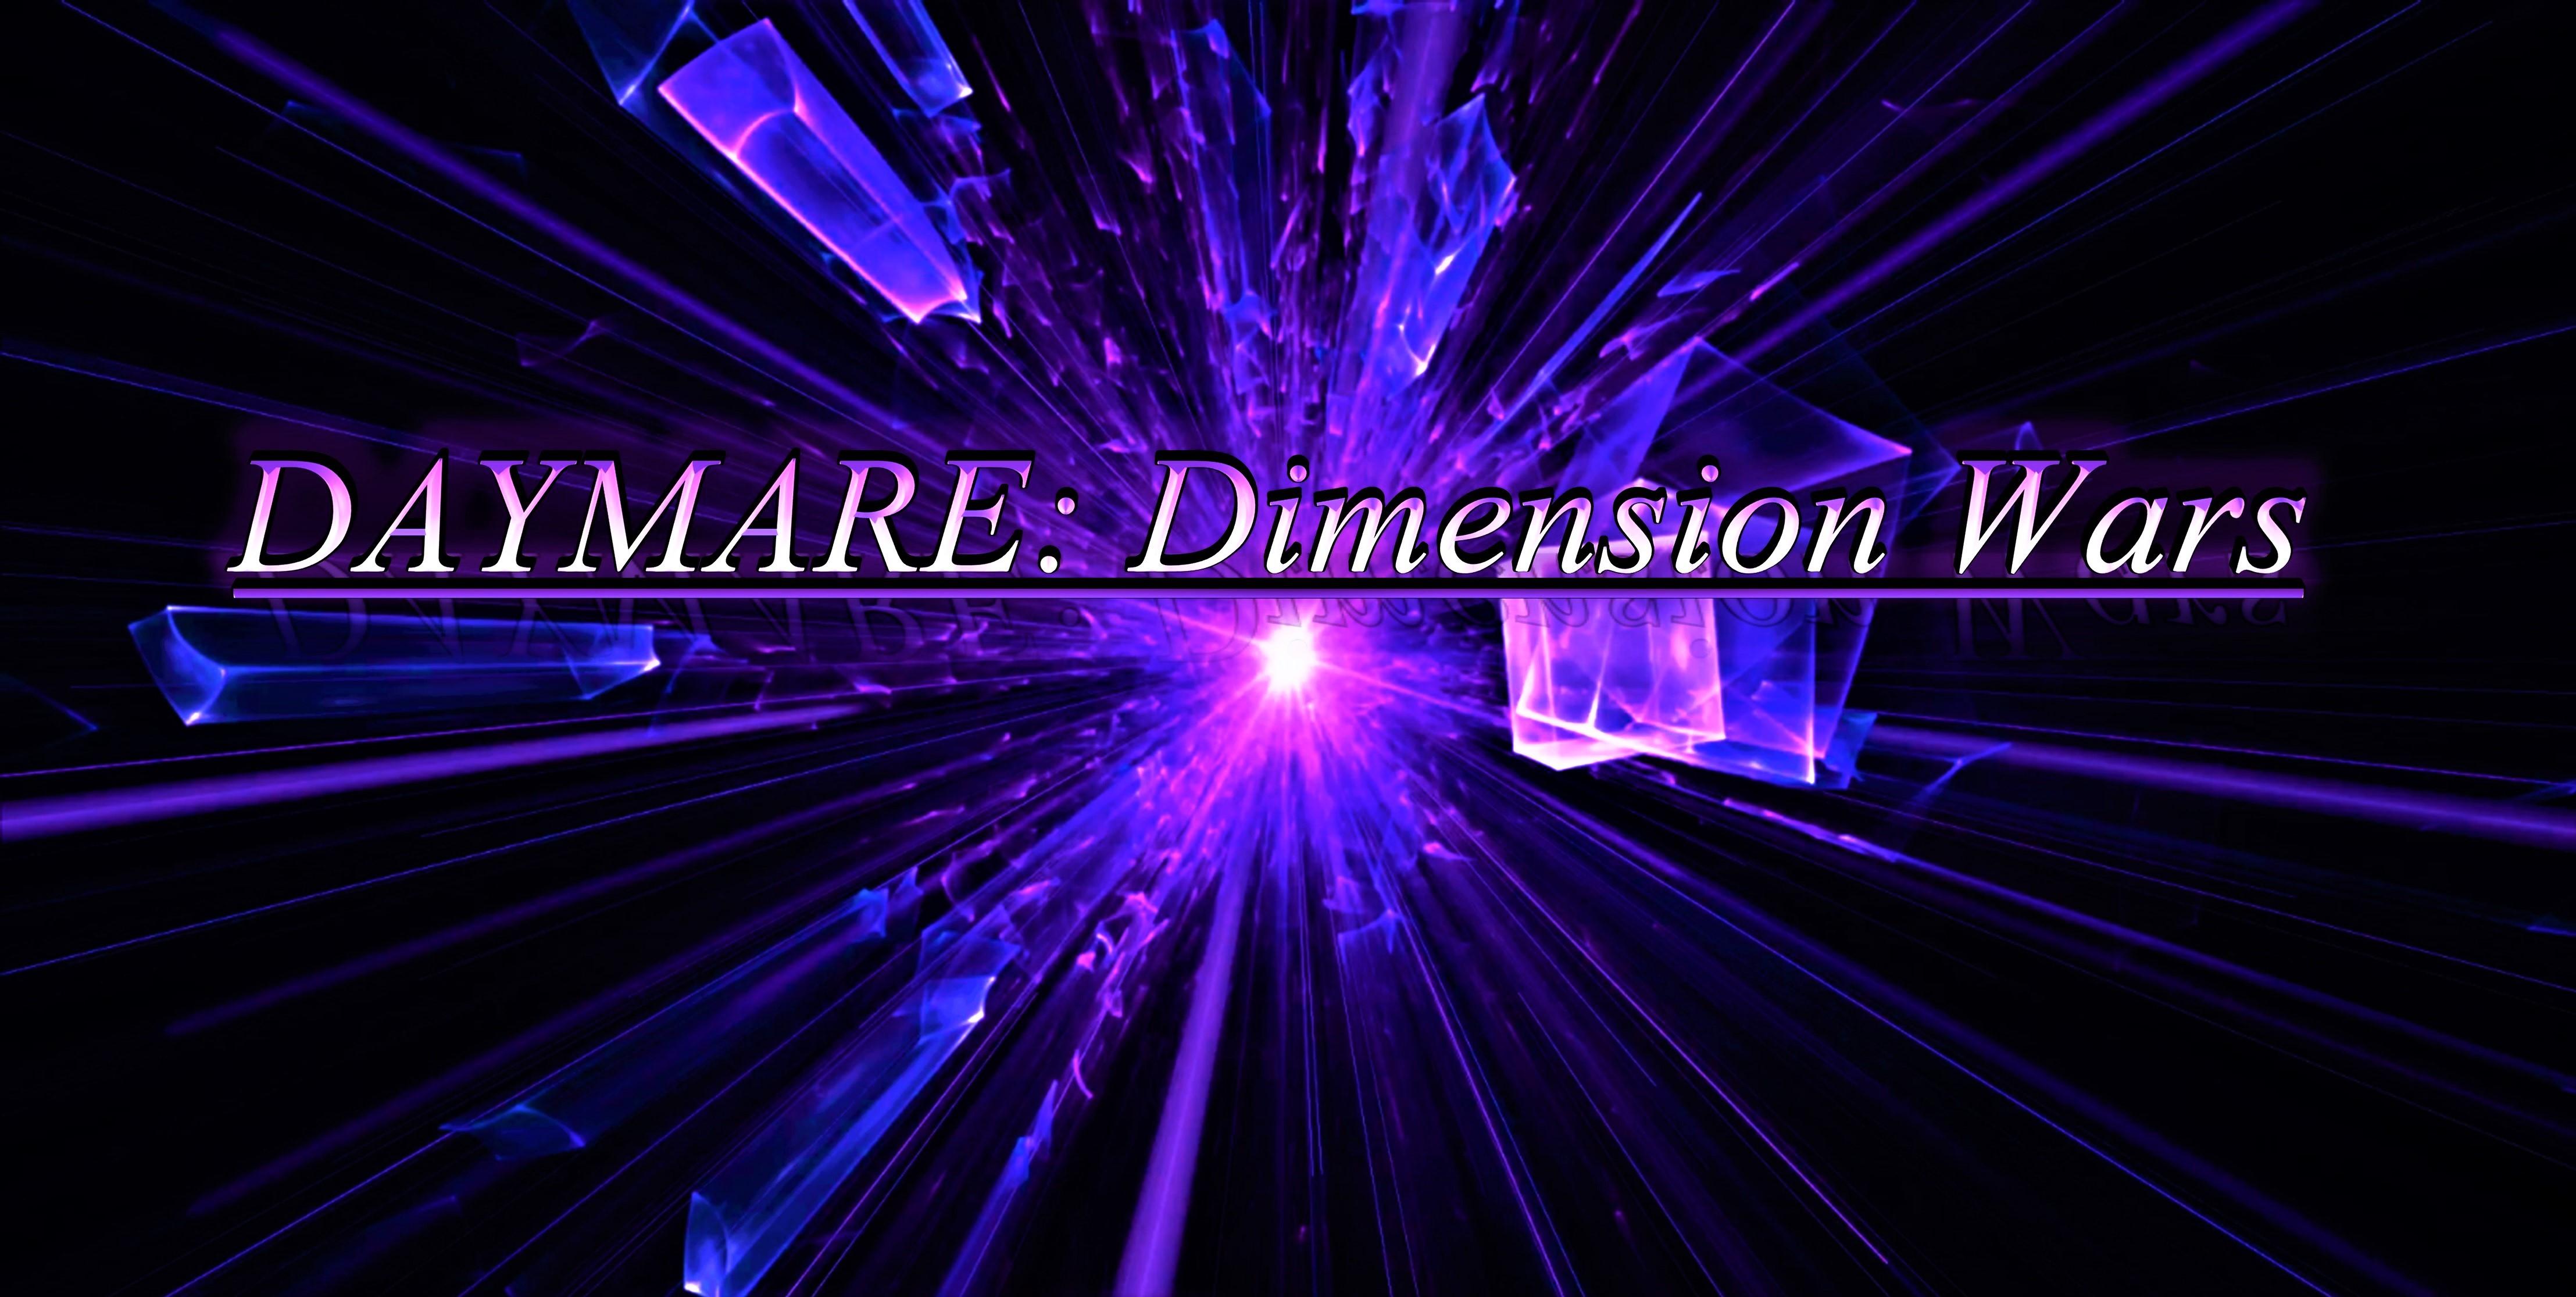 DAYMARE: Dimension Wars